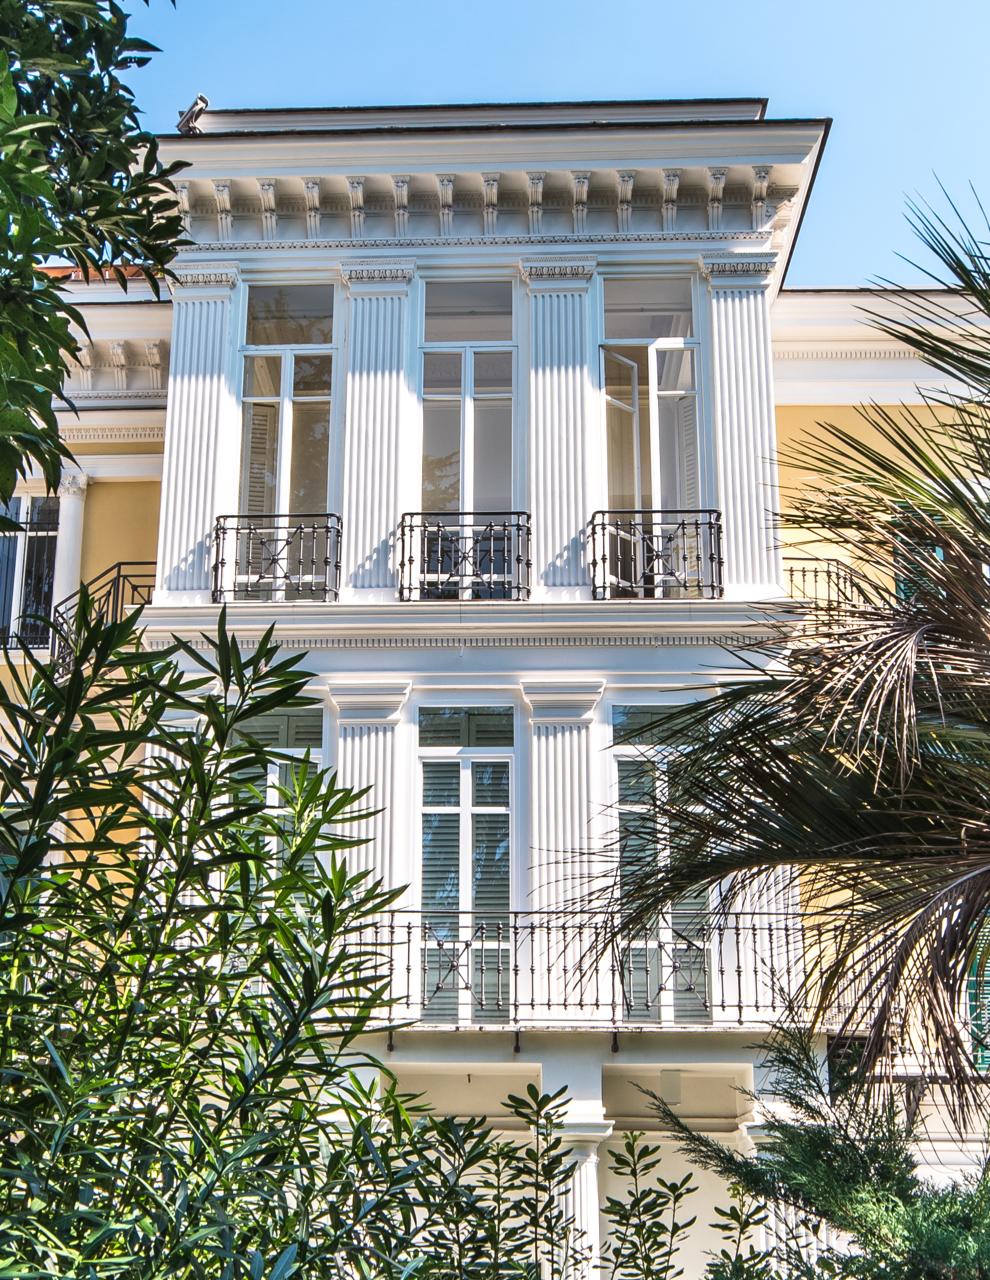 Anteprima Pontano 44 Napoli - Immobili Cittamoderna